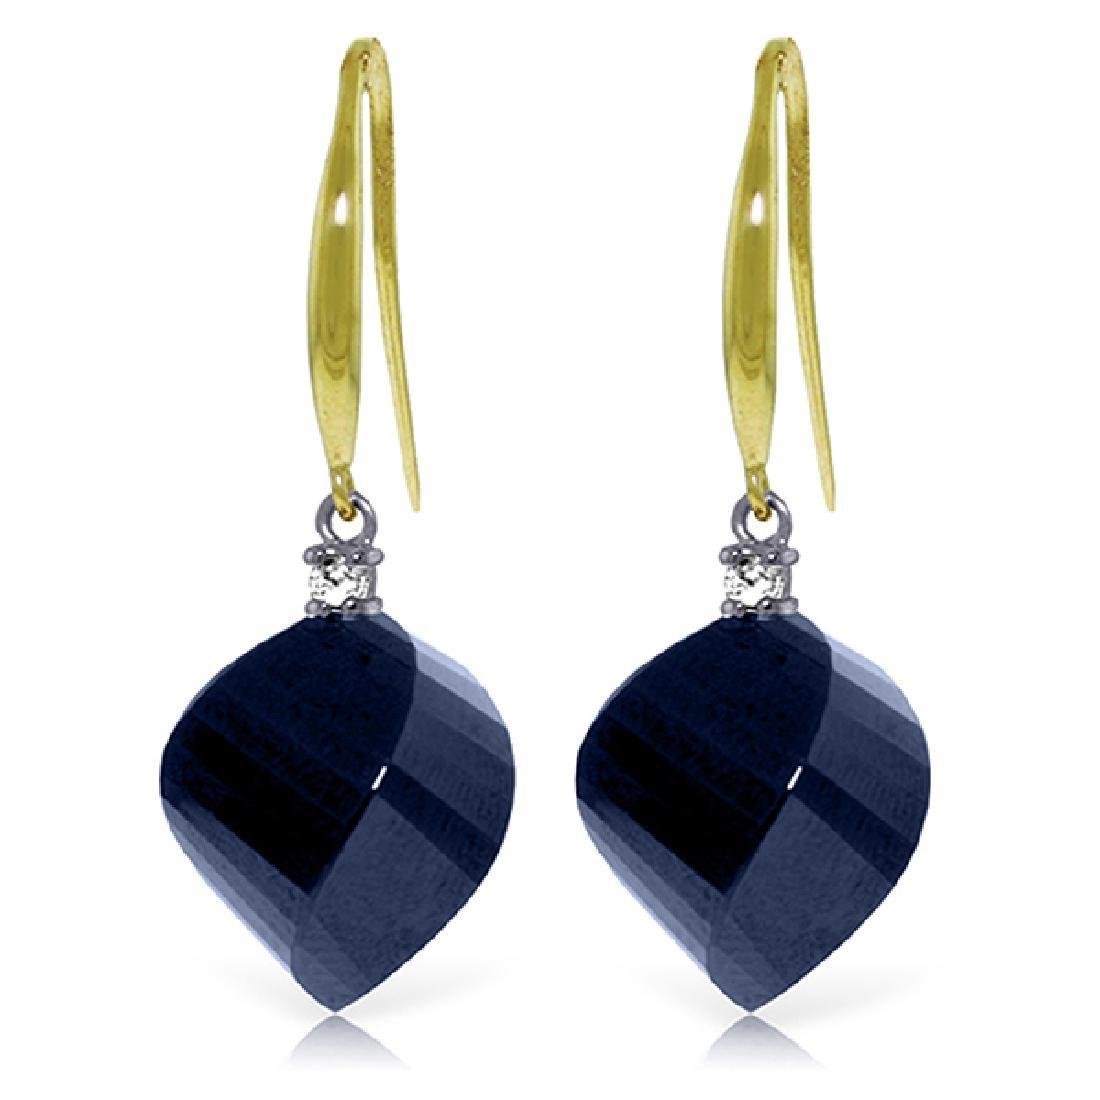 Genuine 30.6 ctw Sapphire & Diamond Earrings Jewelry